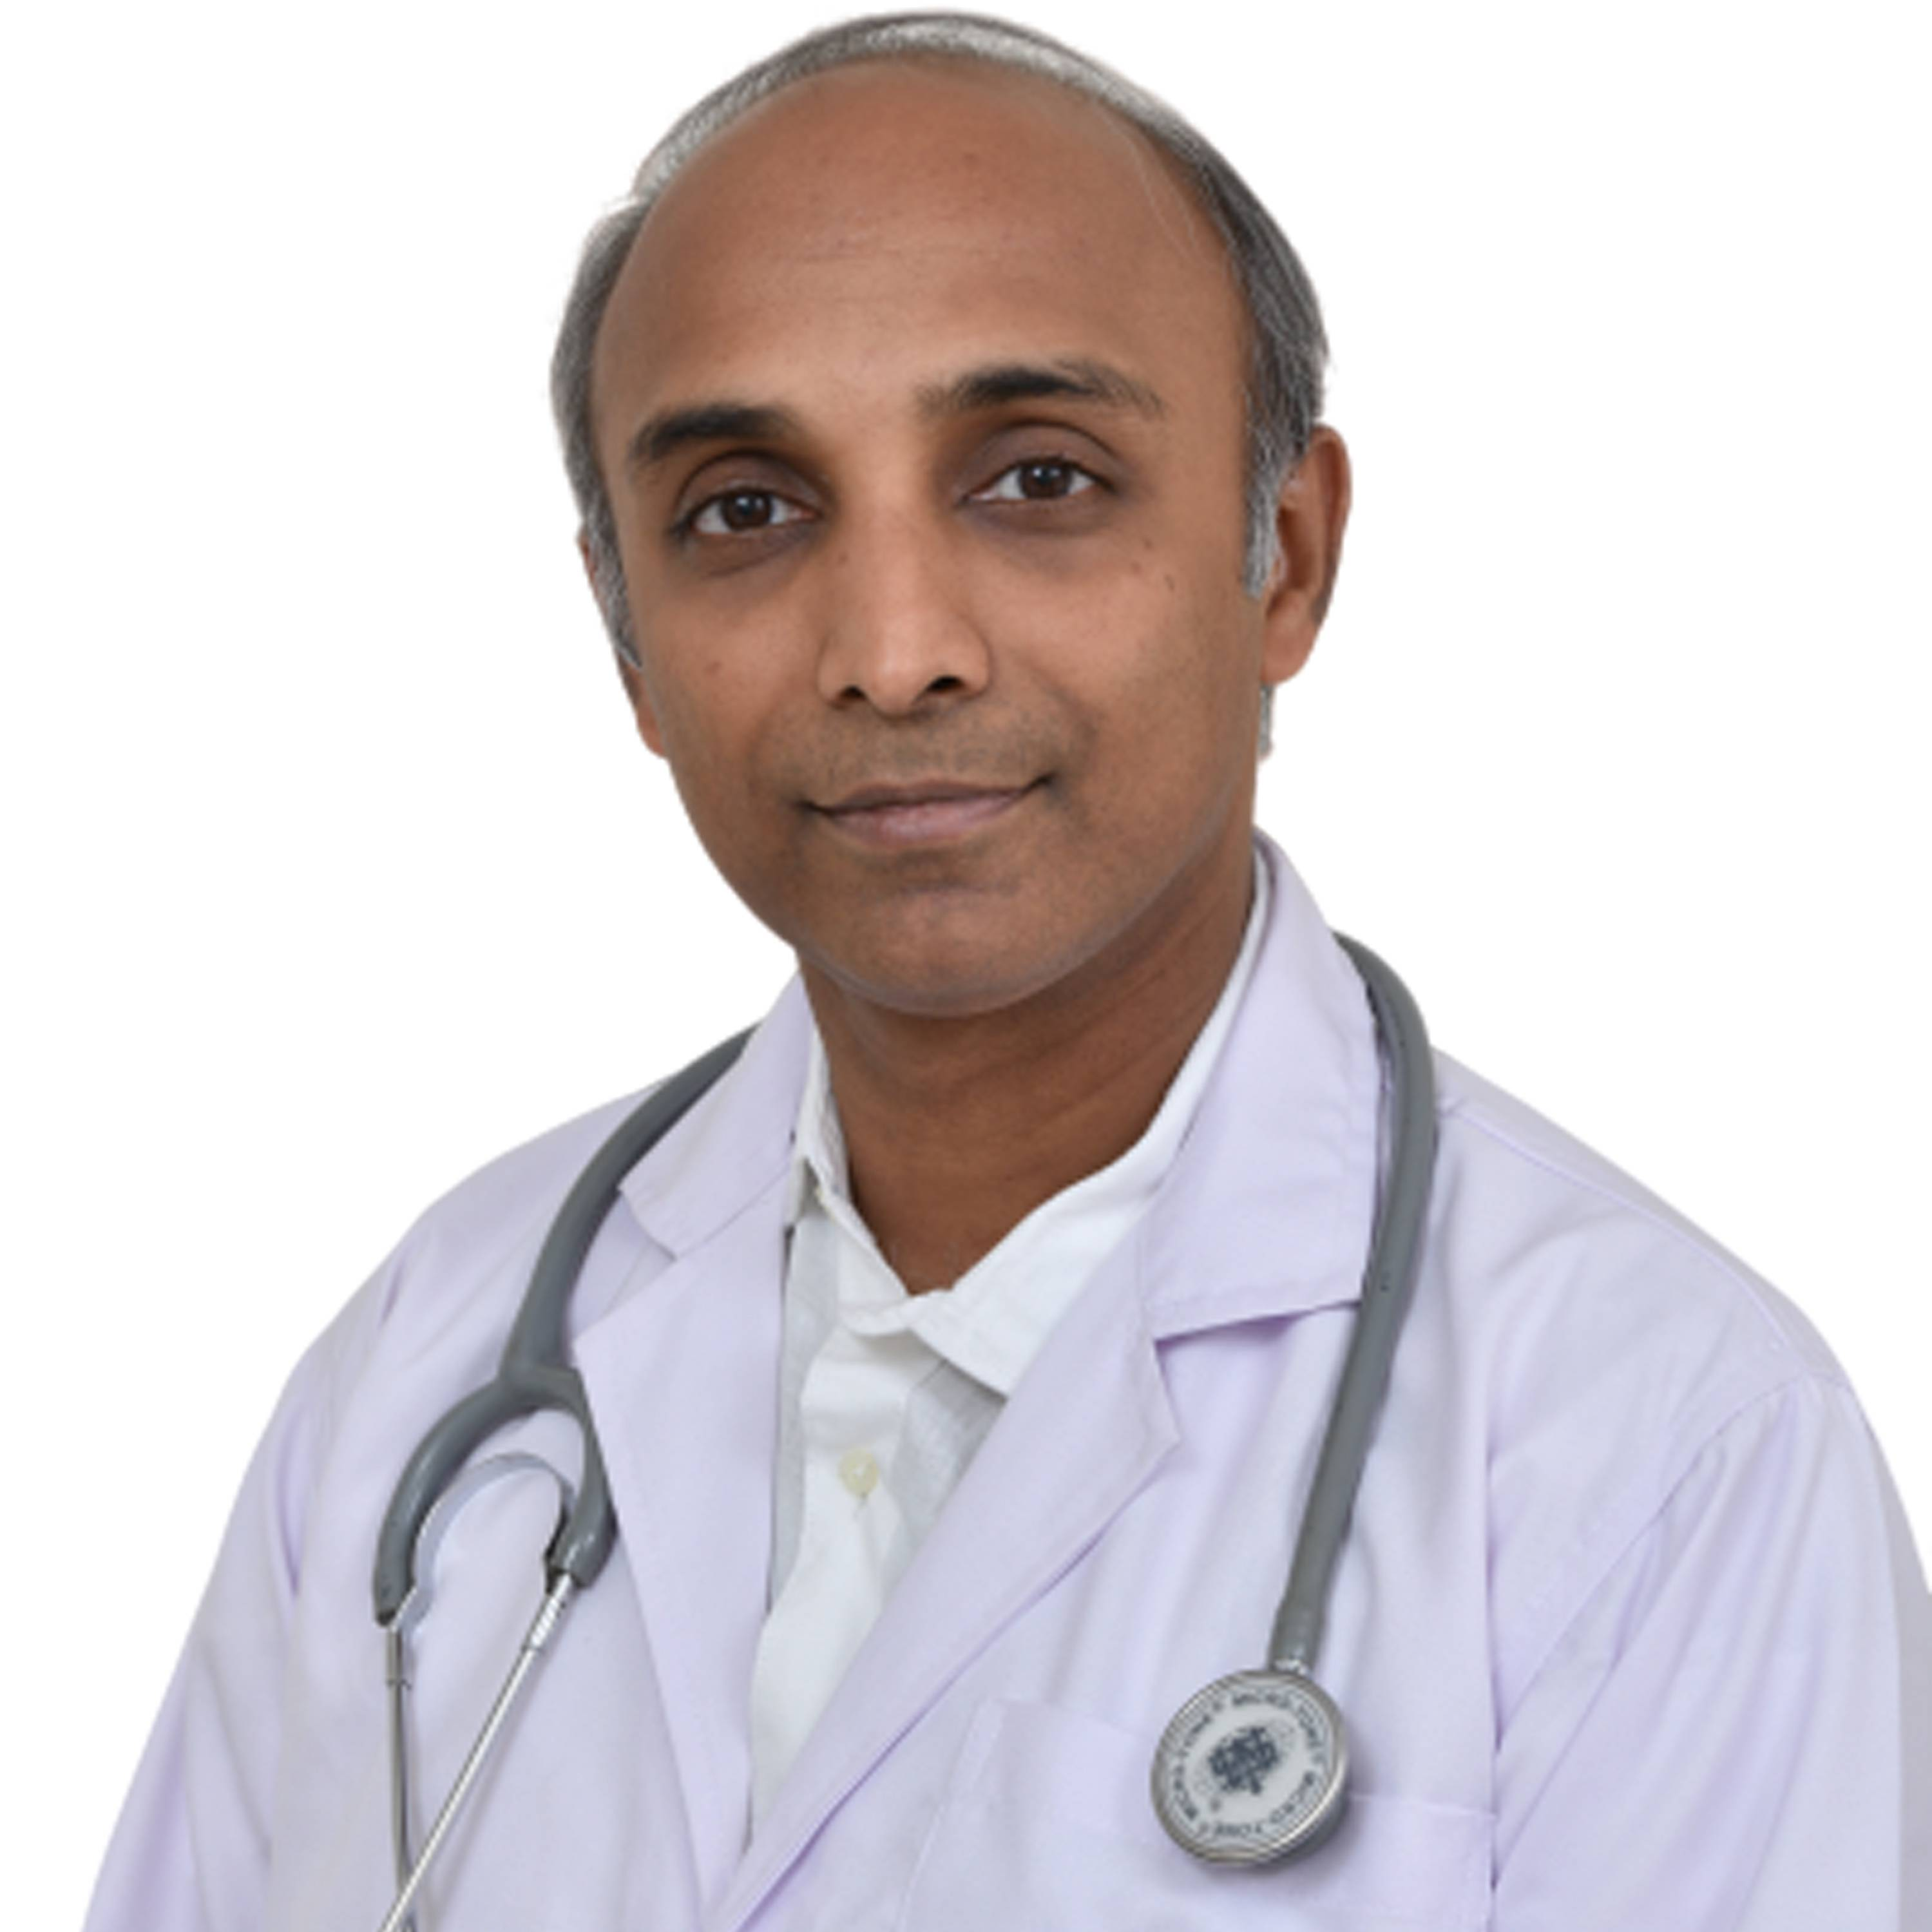 Dr. Rajesh Benny